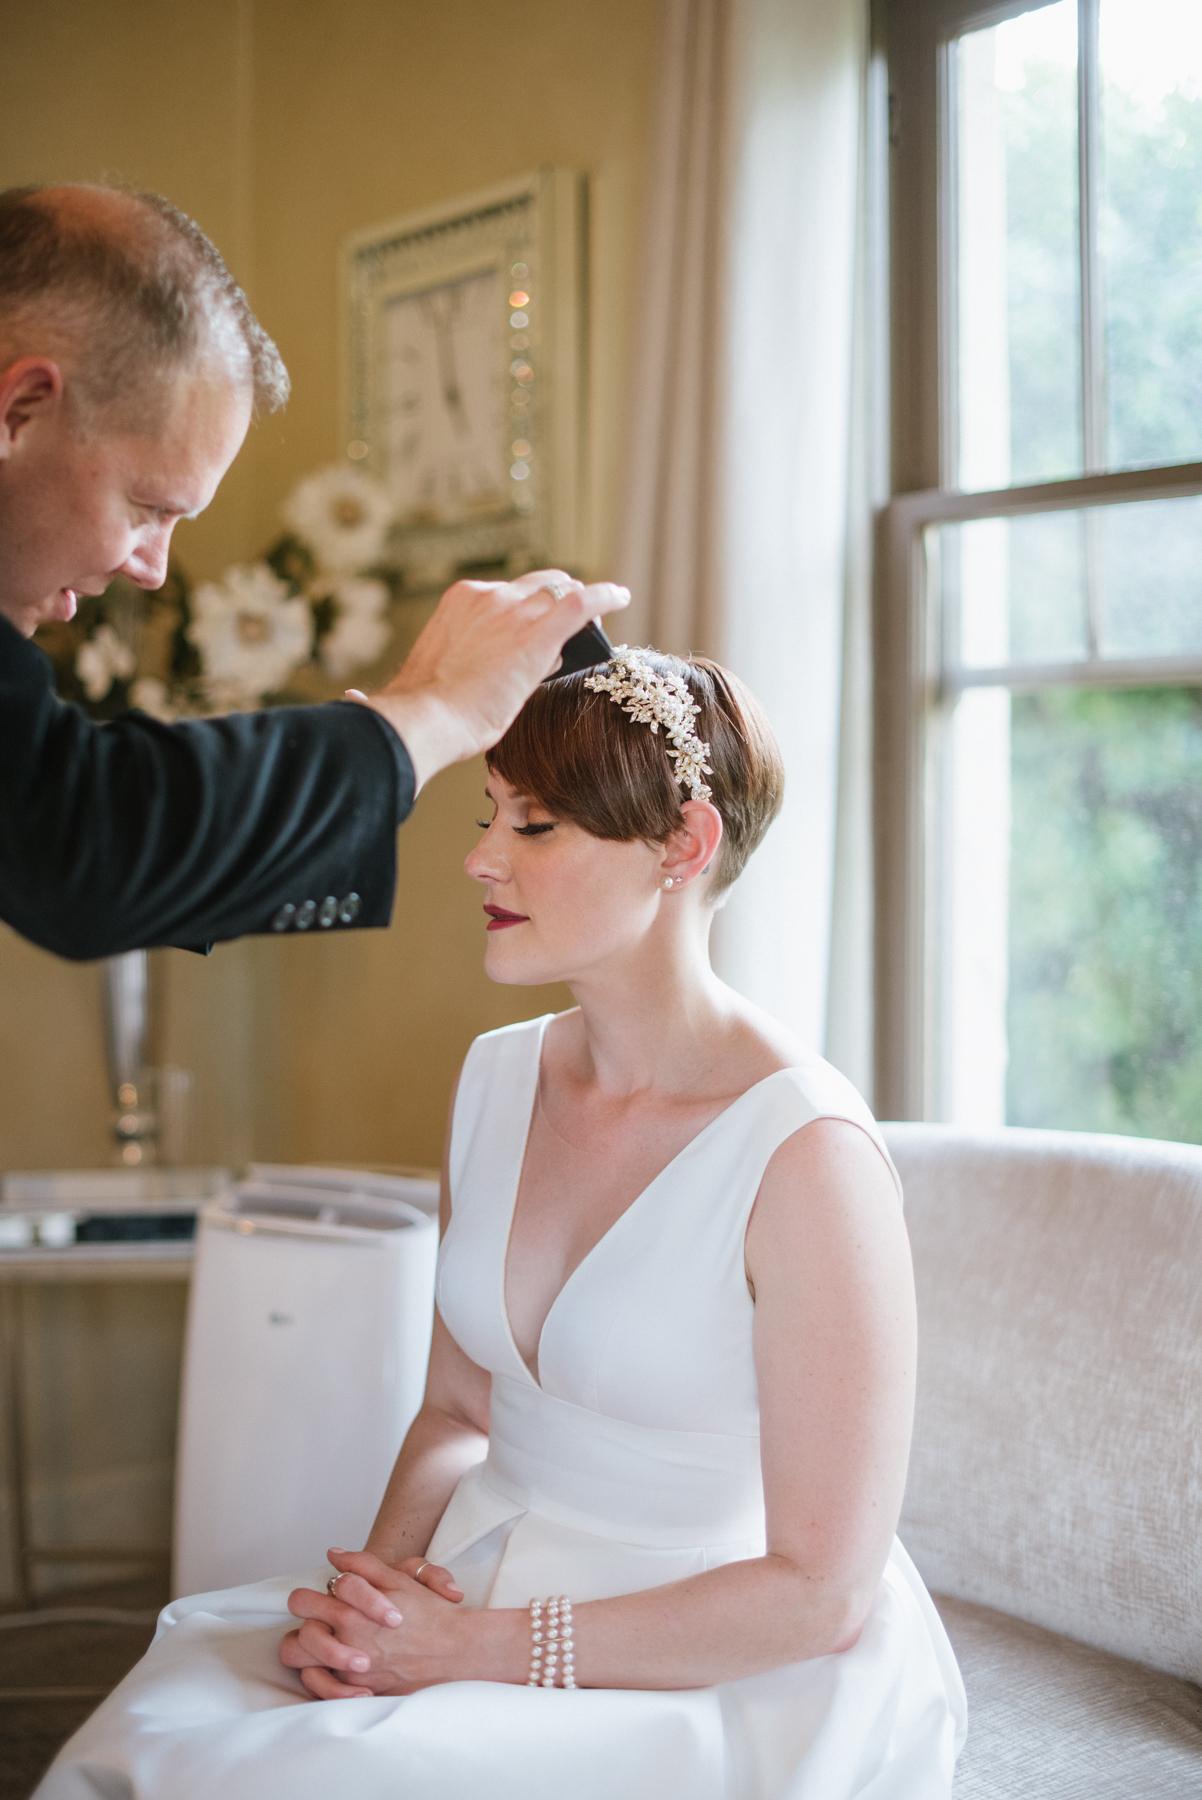 Secret Garden Event Center Wedding - Meredith Amadee Photography-13-2.jpg